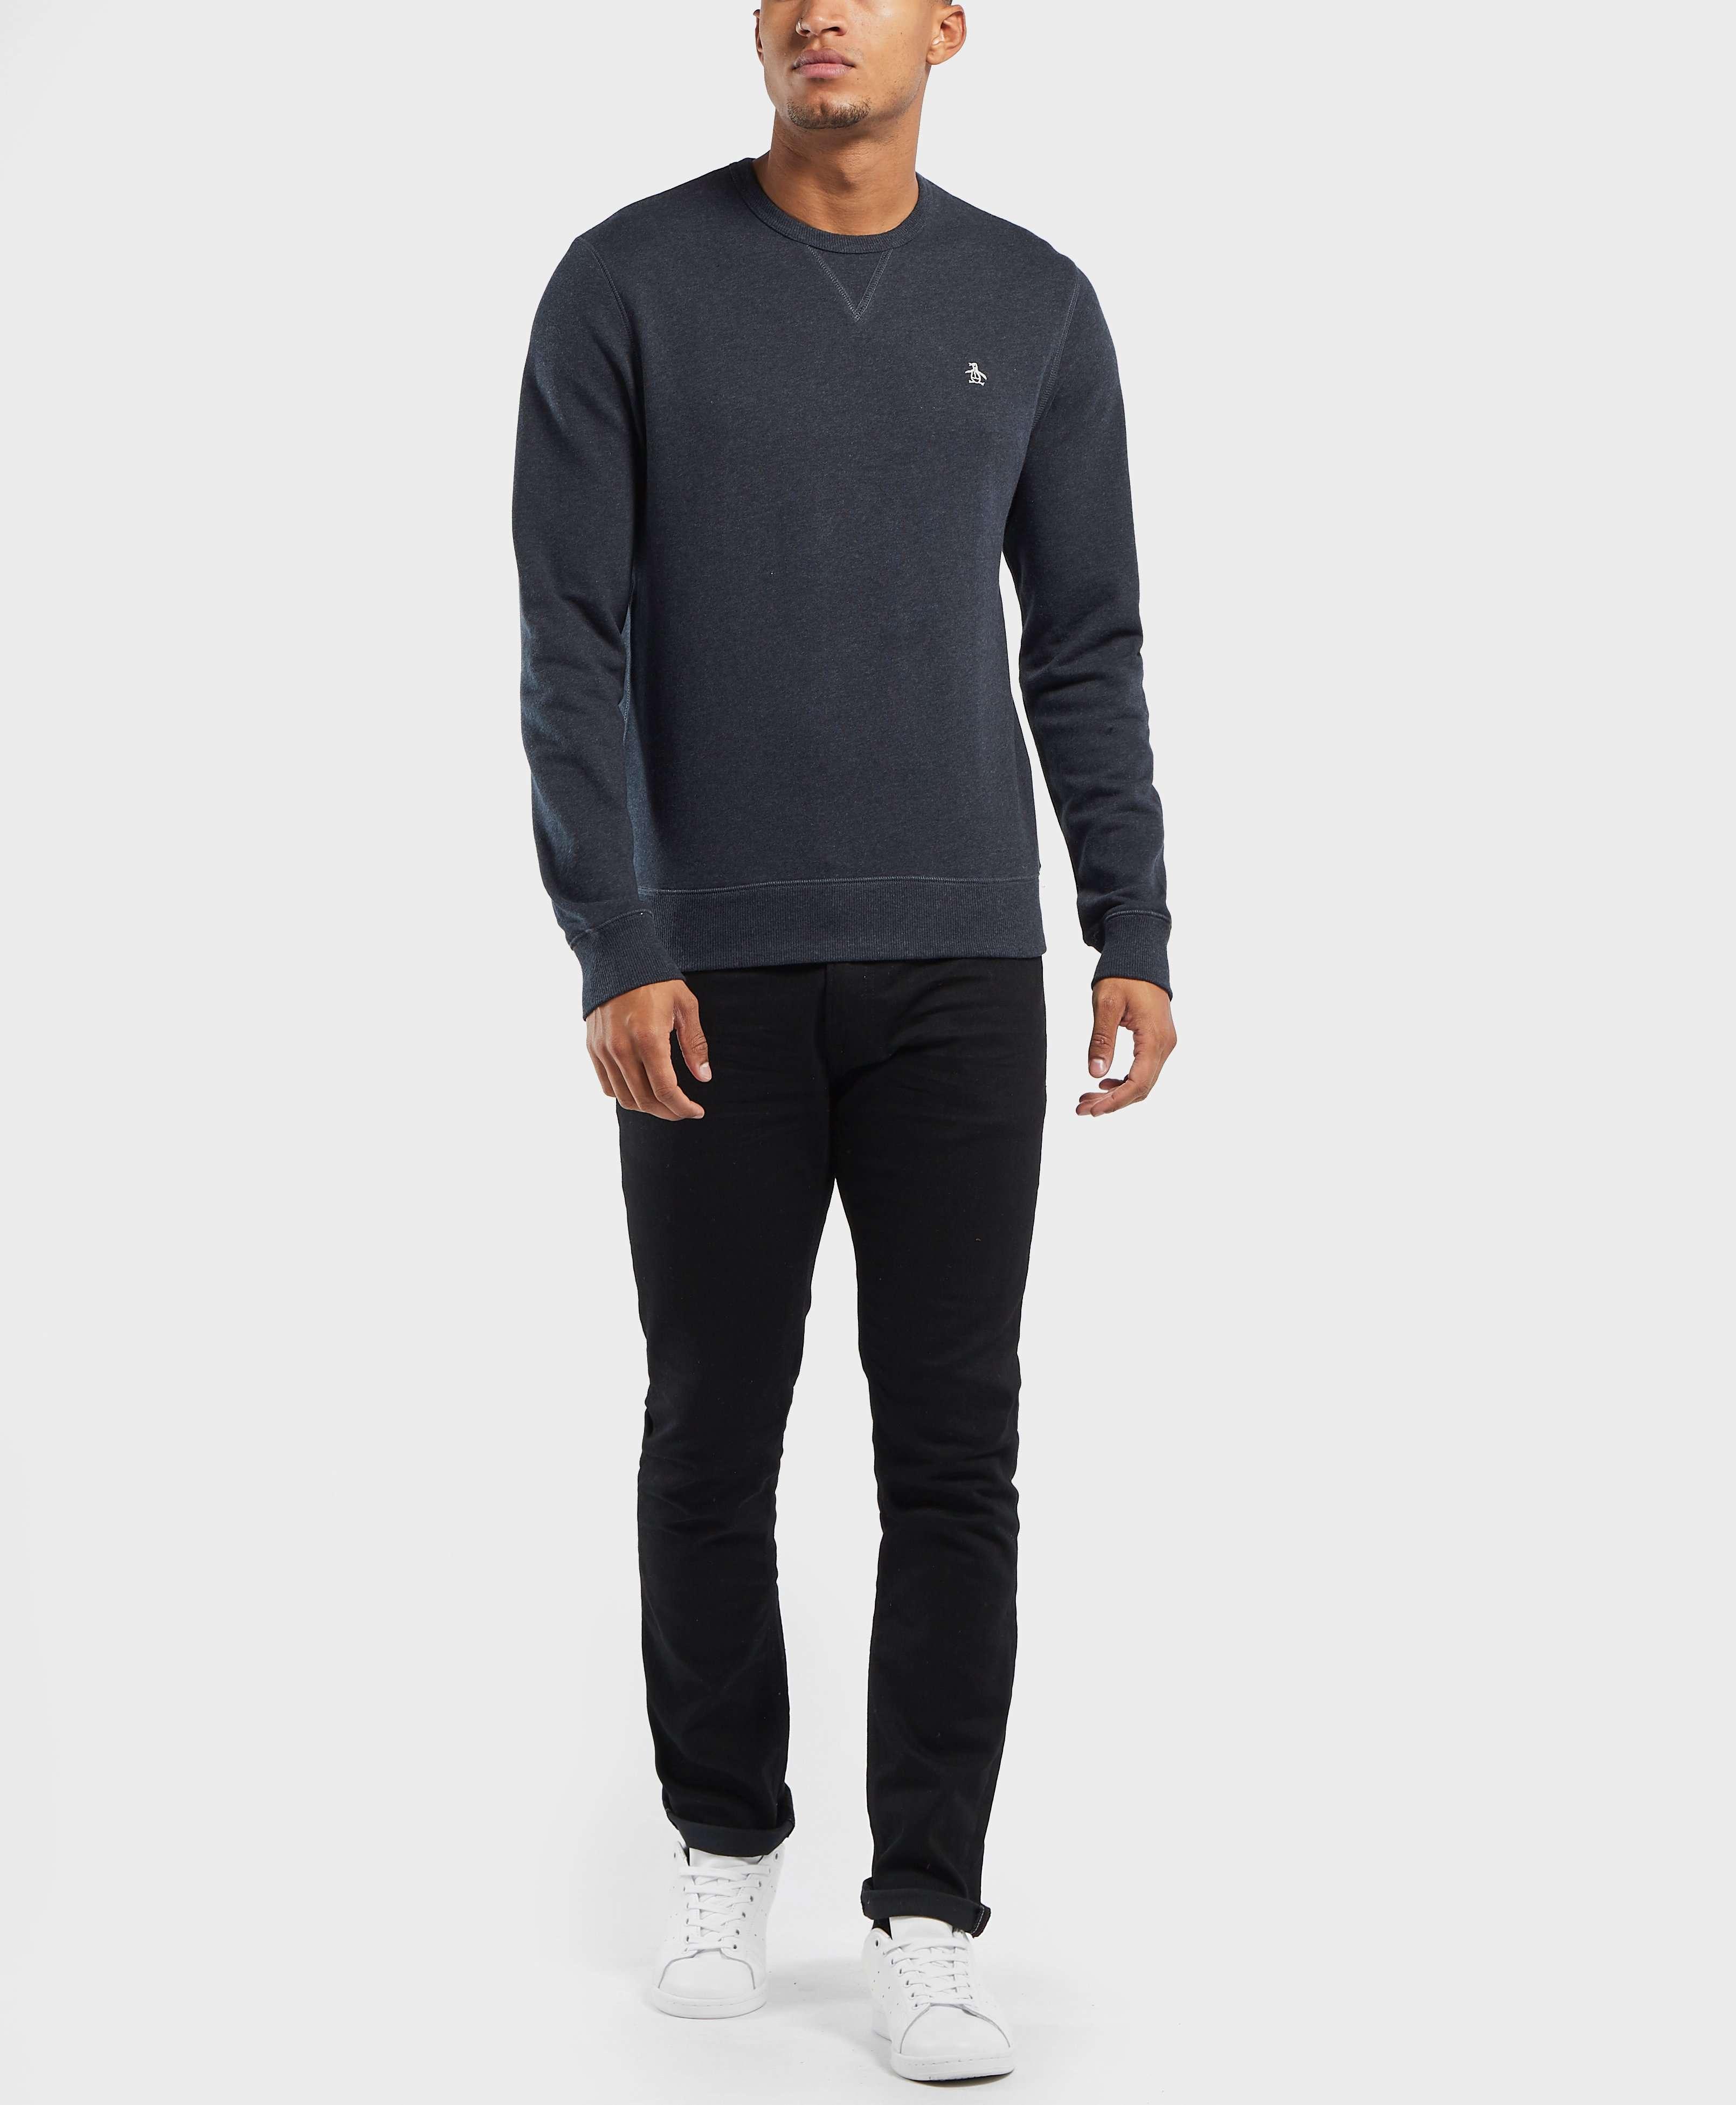 Original Penguin Basic Crew Sweatshirt